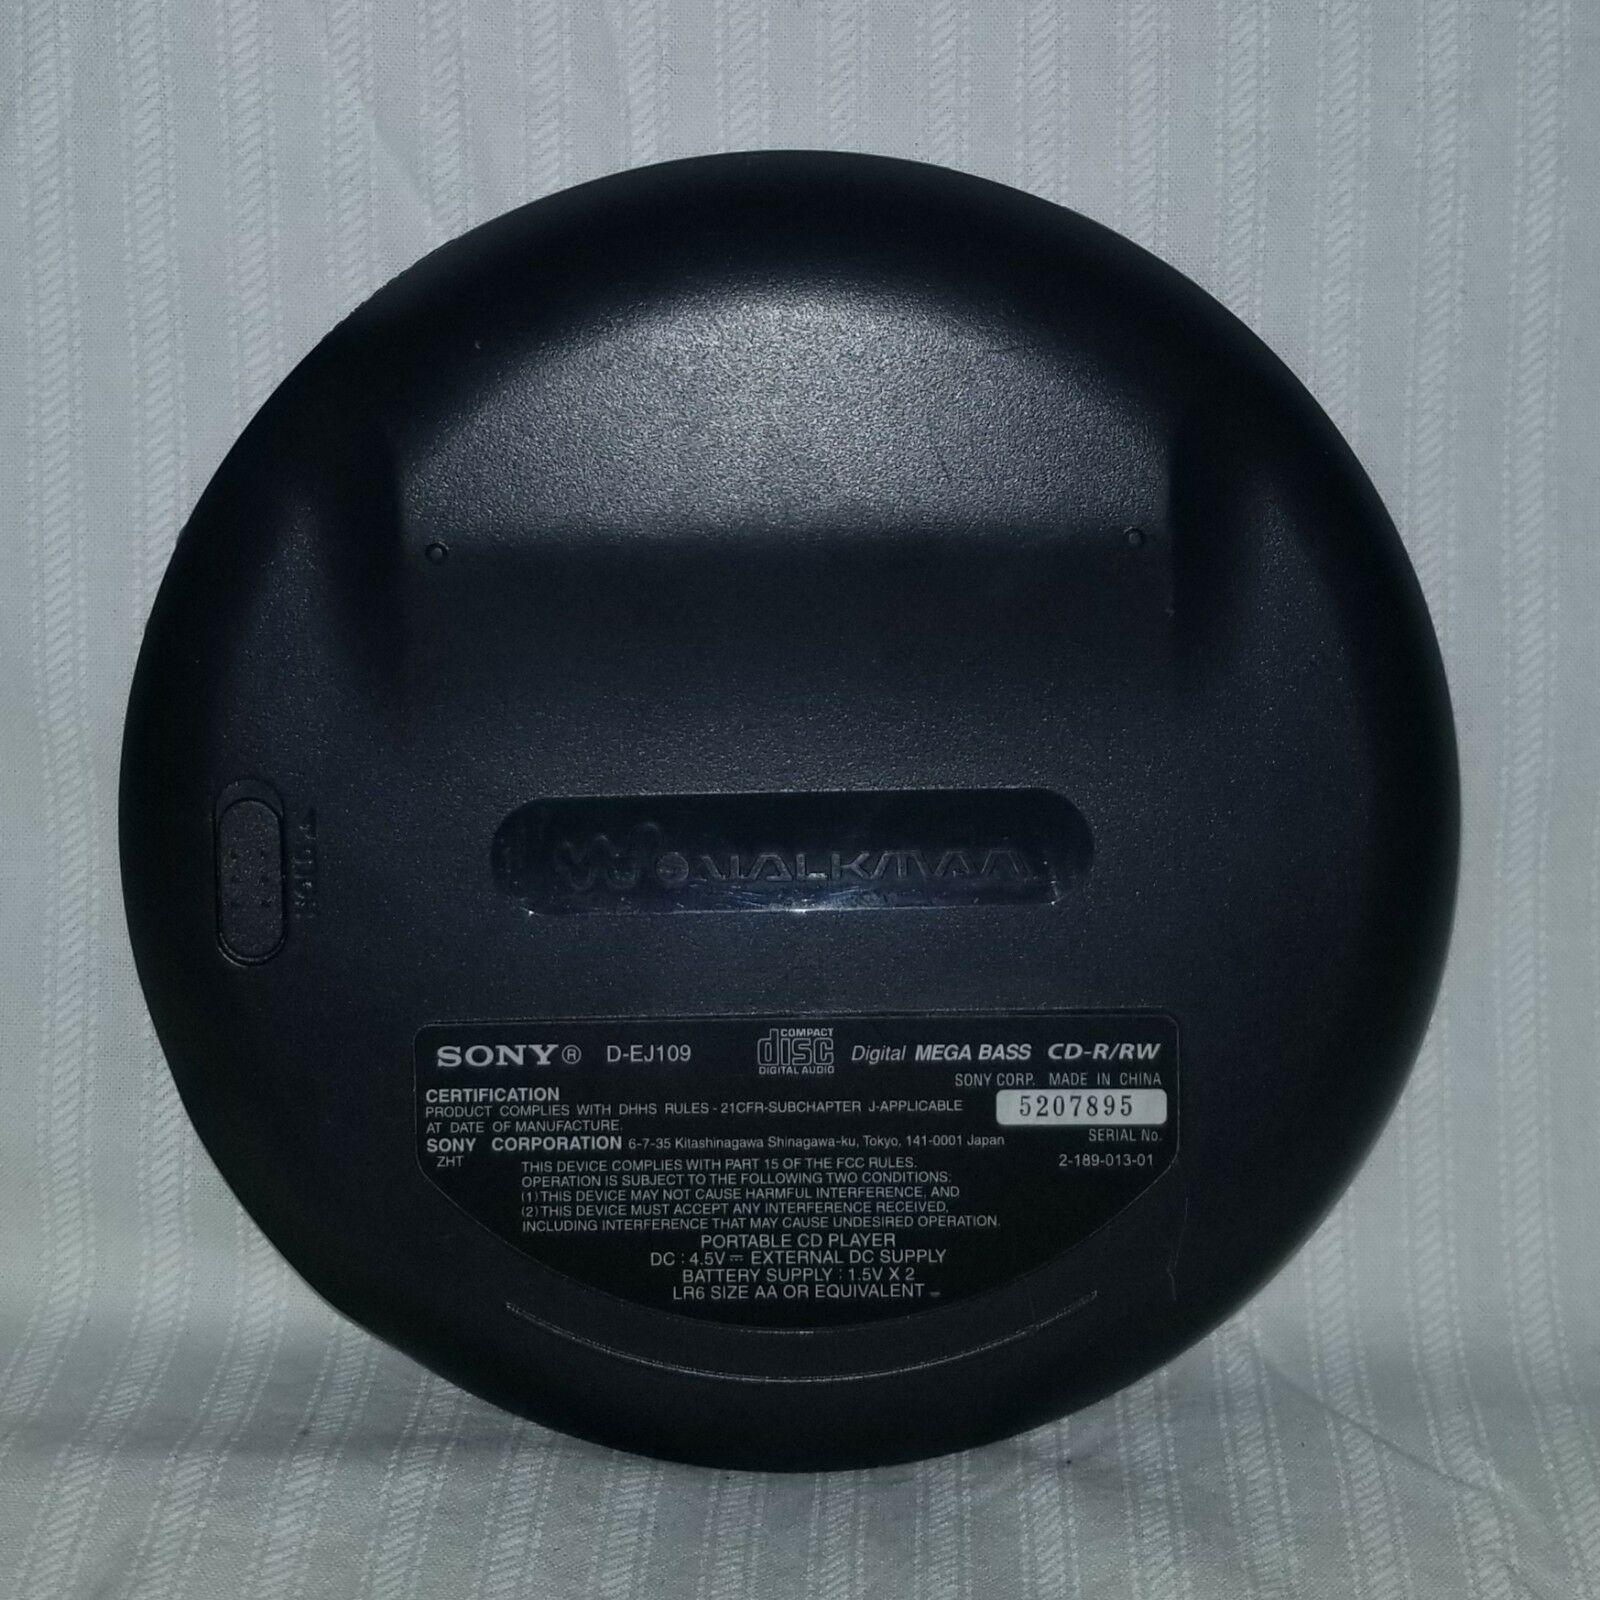 sony cd walkman D-EJ109 image 3